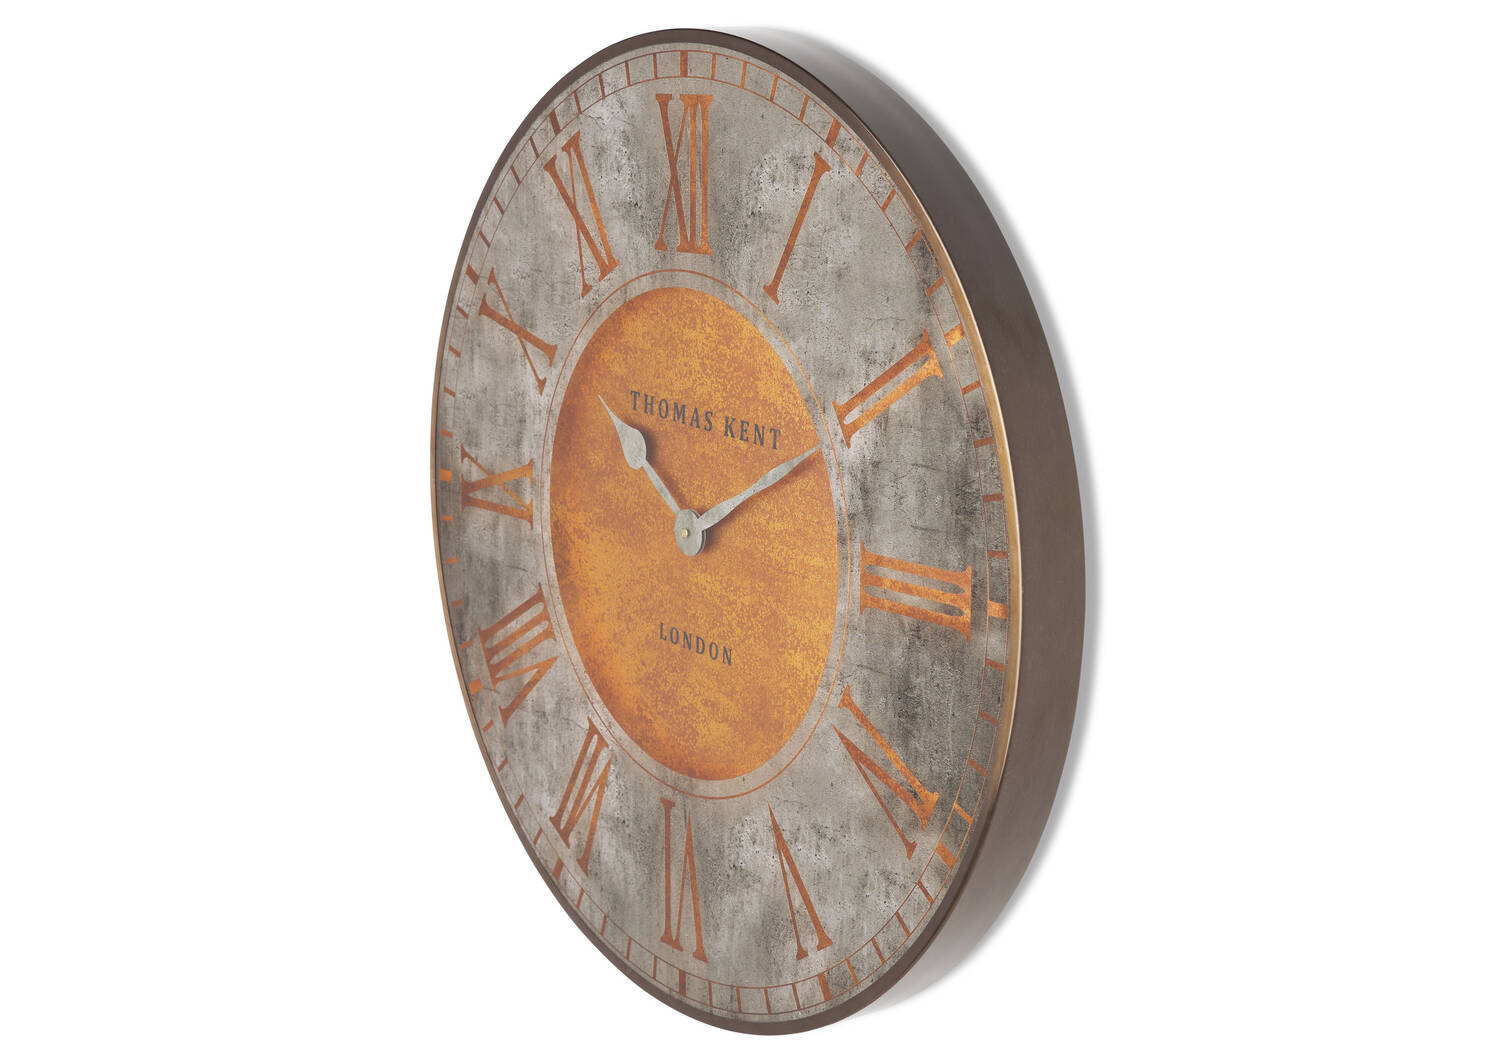 Cleverdon Wall Clock